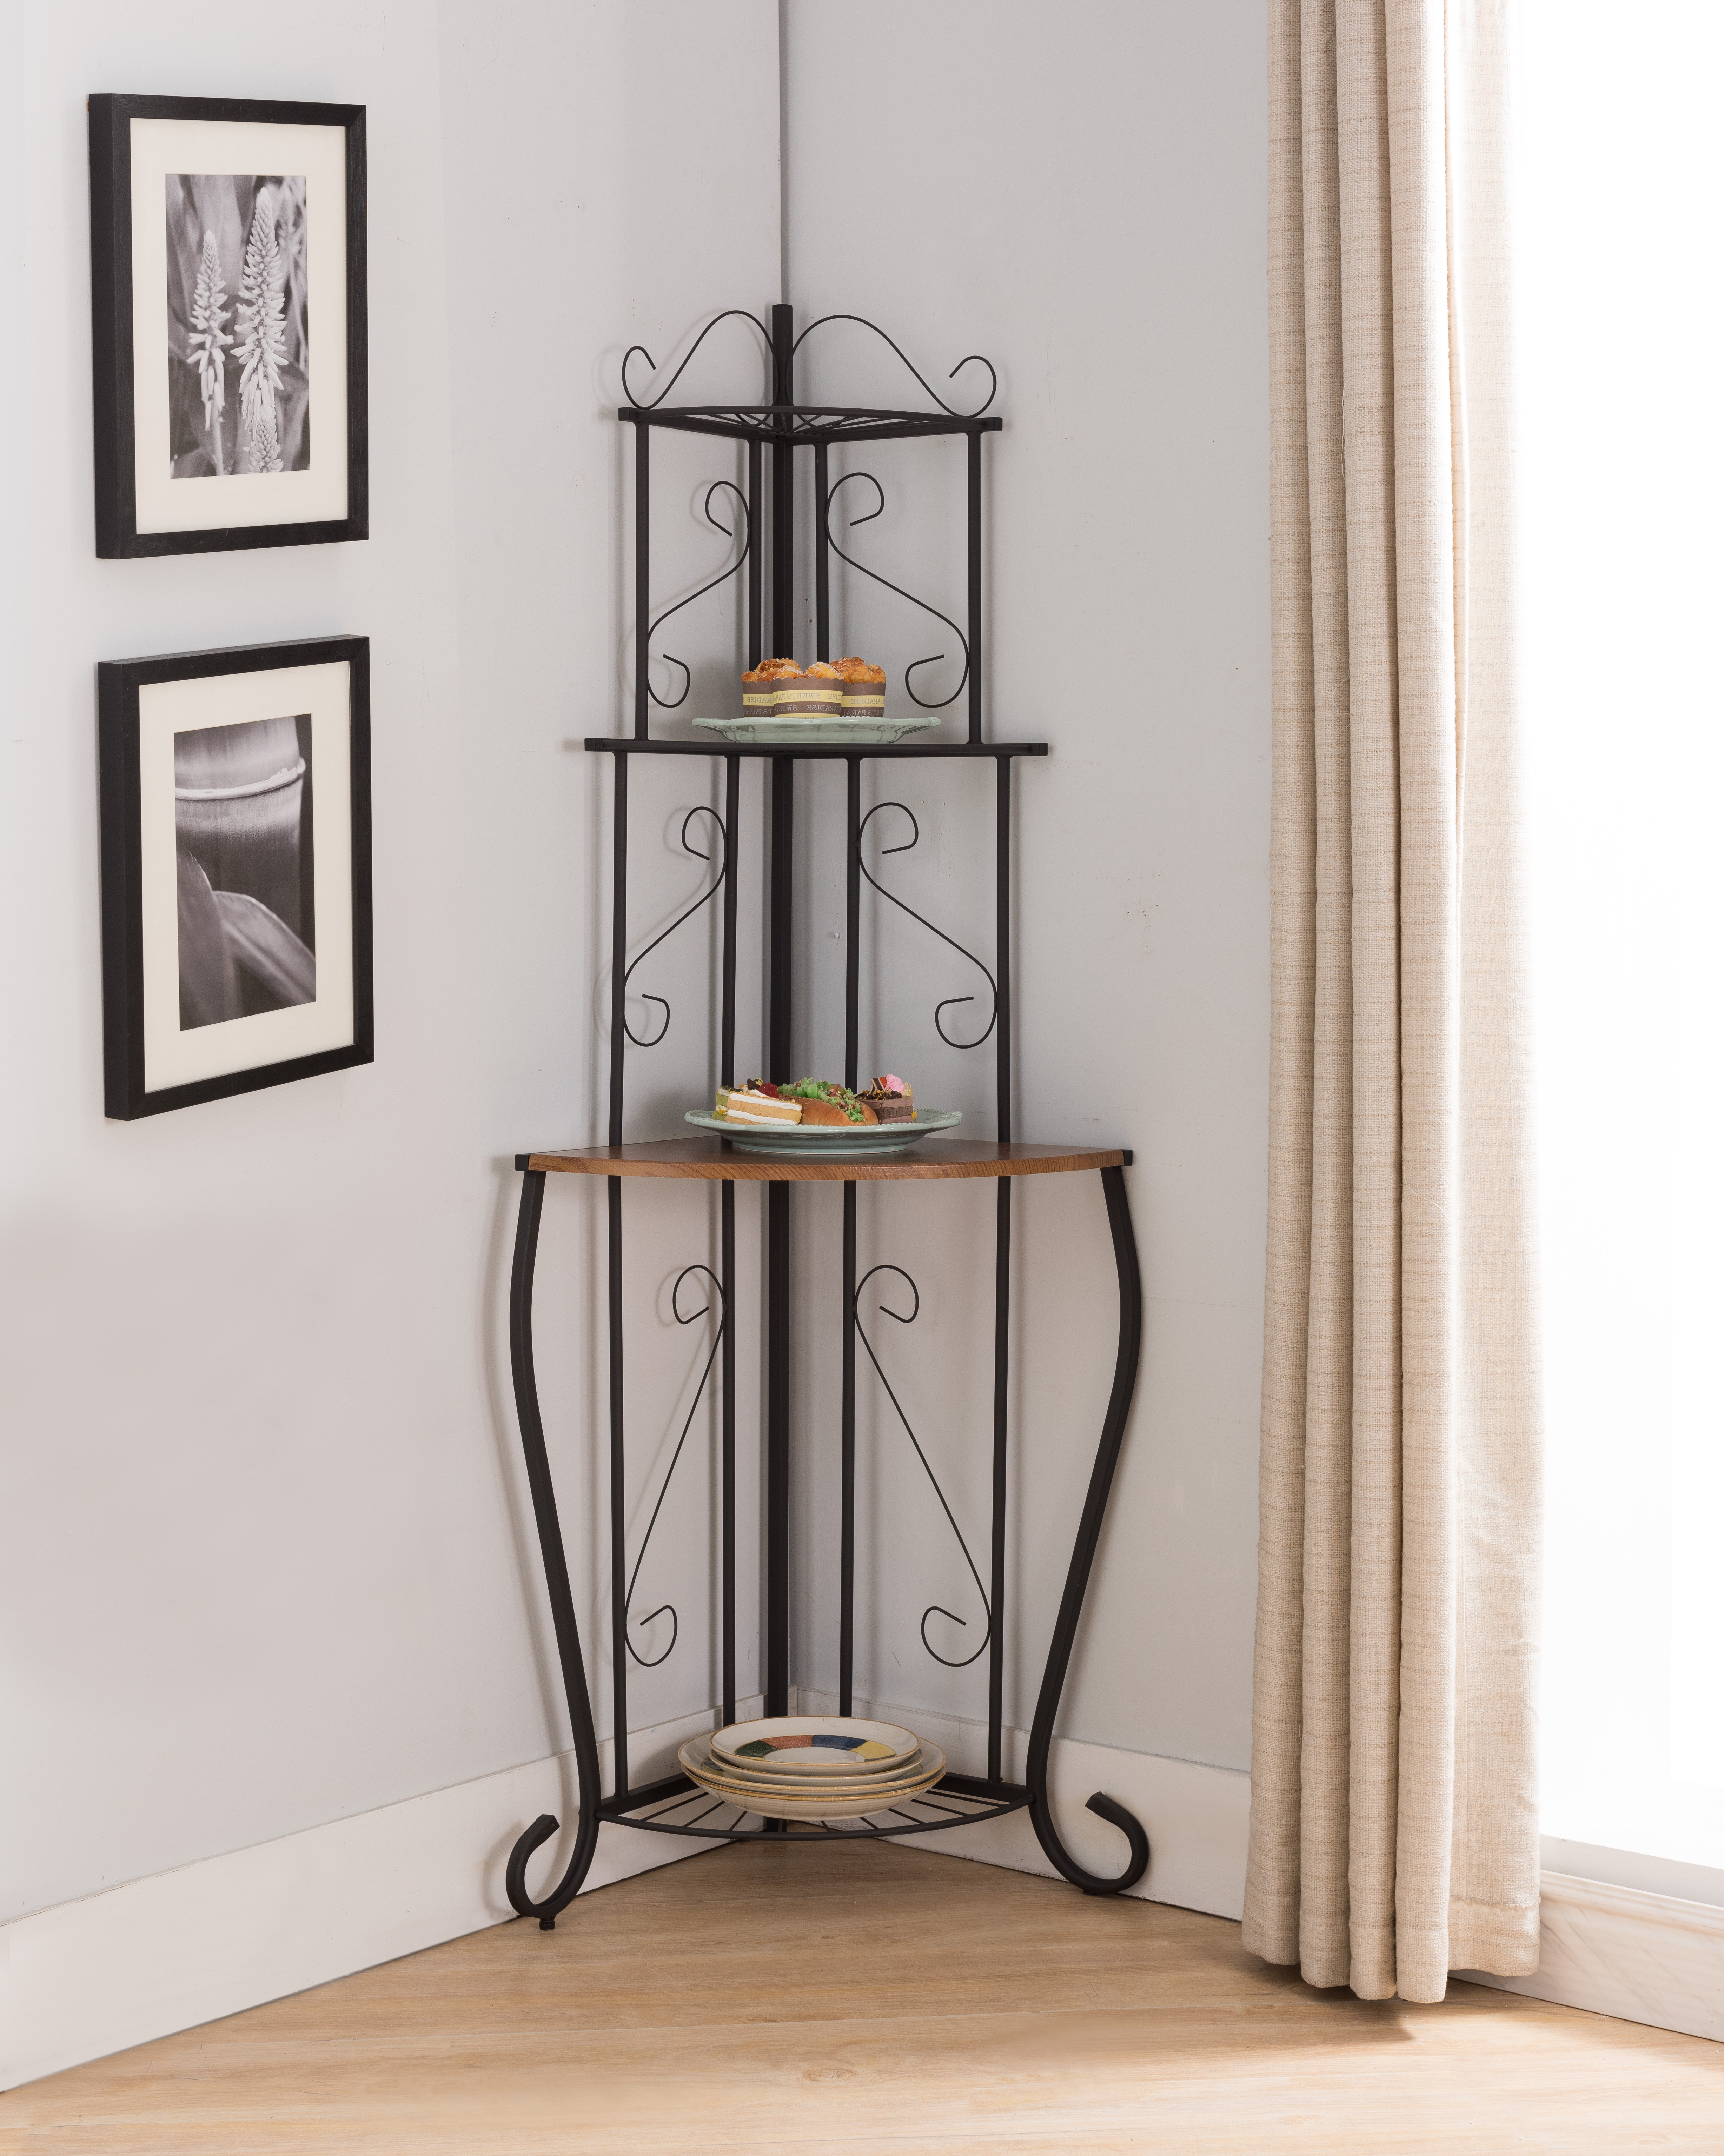 Black & Walnut Metal 3 Tier Corner Kitchen Bakers Rack Display Stand Organizer With Storage Shelves by unknown